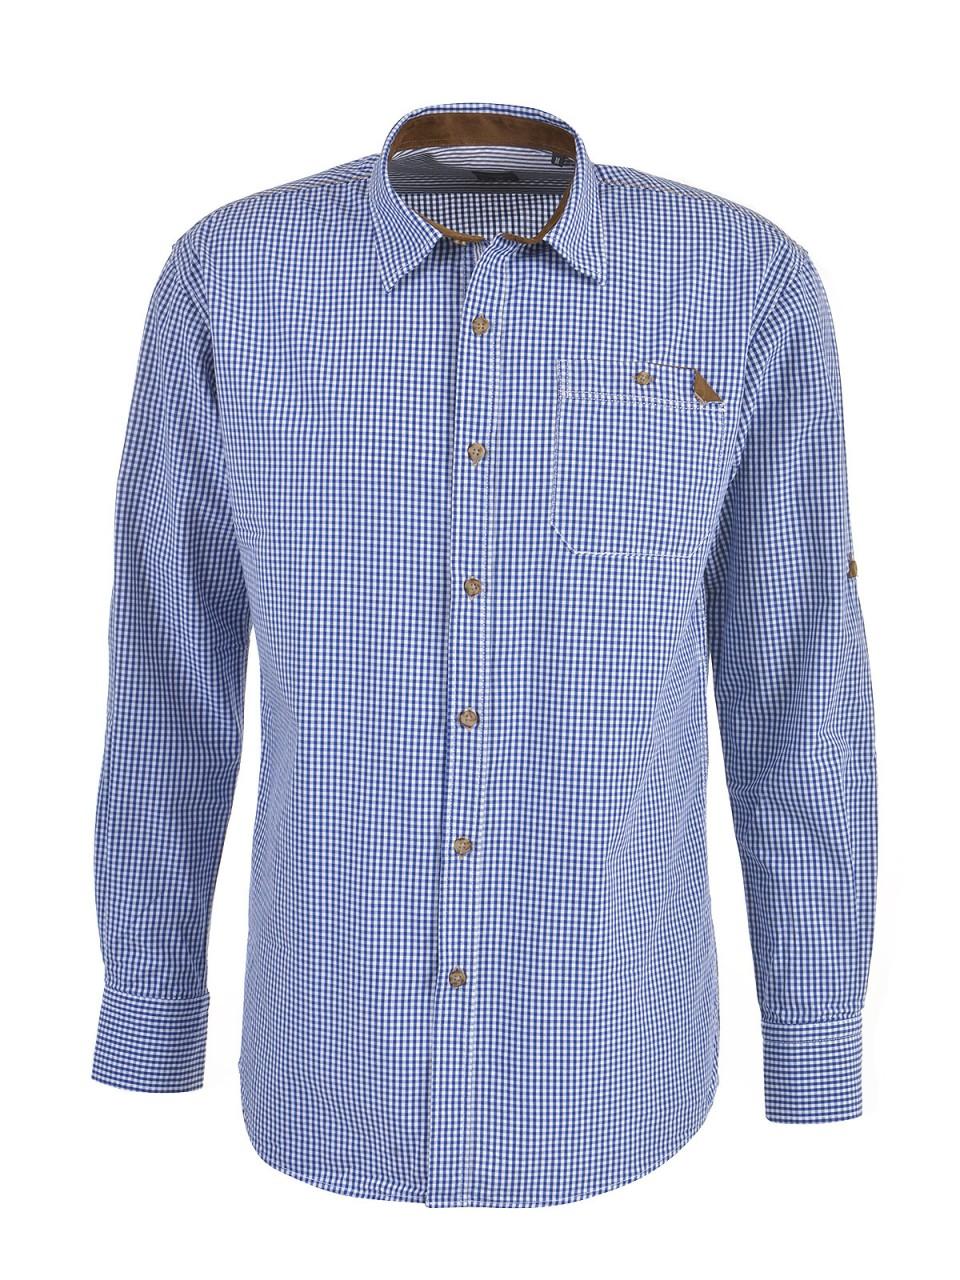 milano-italy-herren-hemd-blau-wei-szlig-, 23.98 EUR @ designermode-com-mode